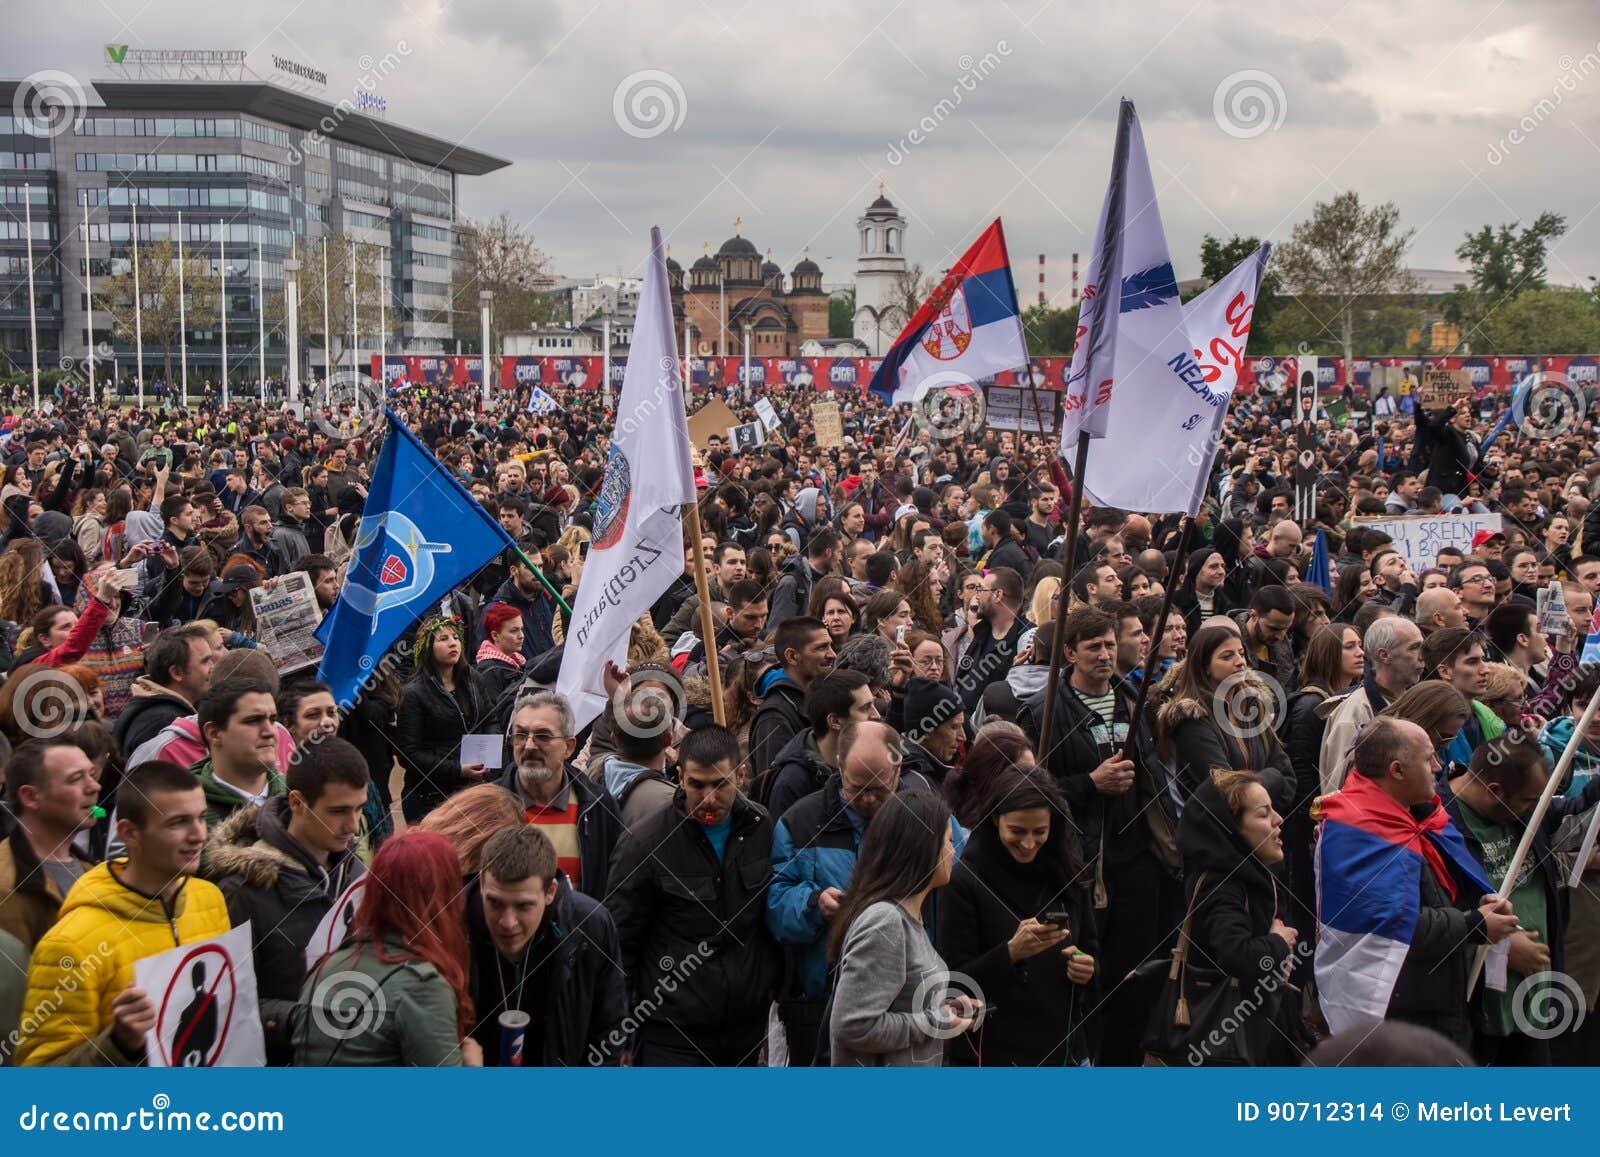 Protest against election of premier Aleksandar Vucic as president, Belgrade